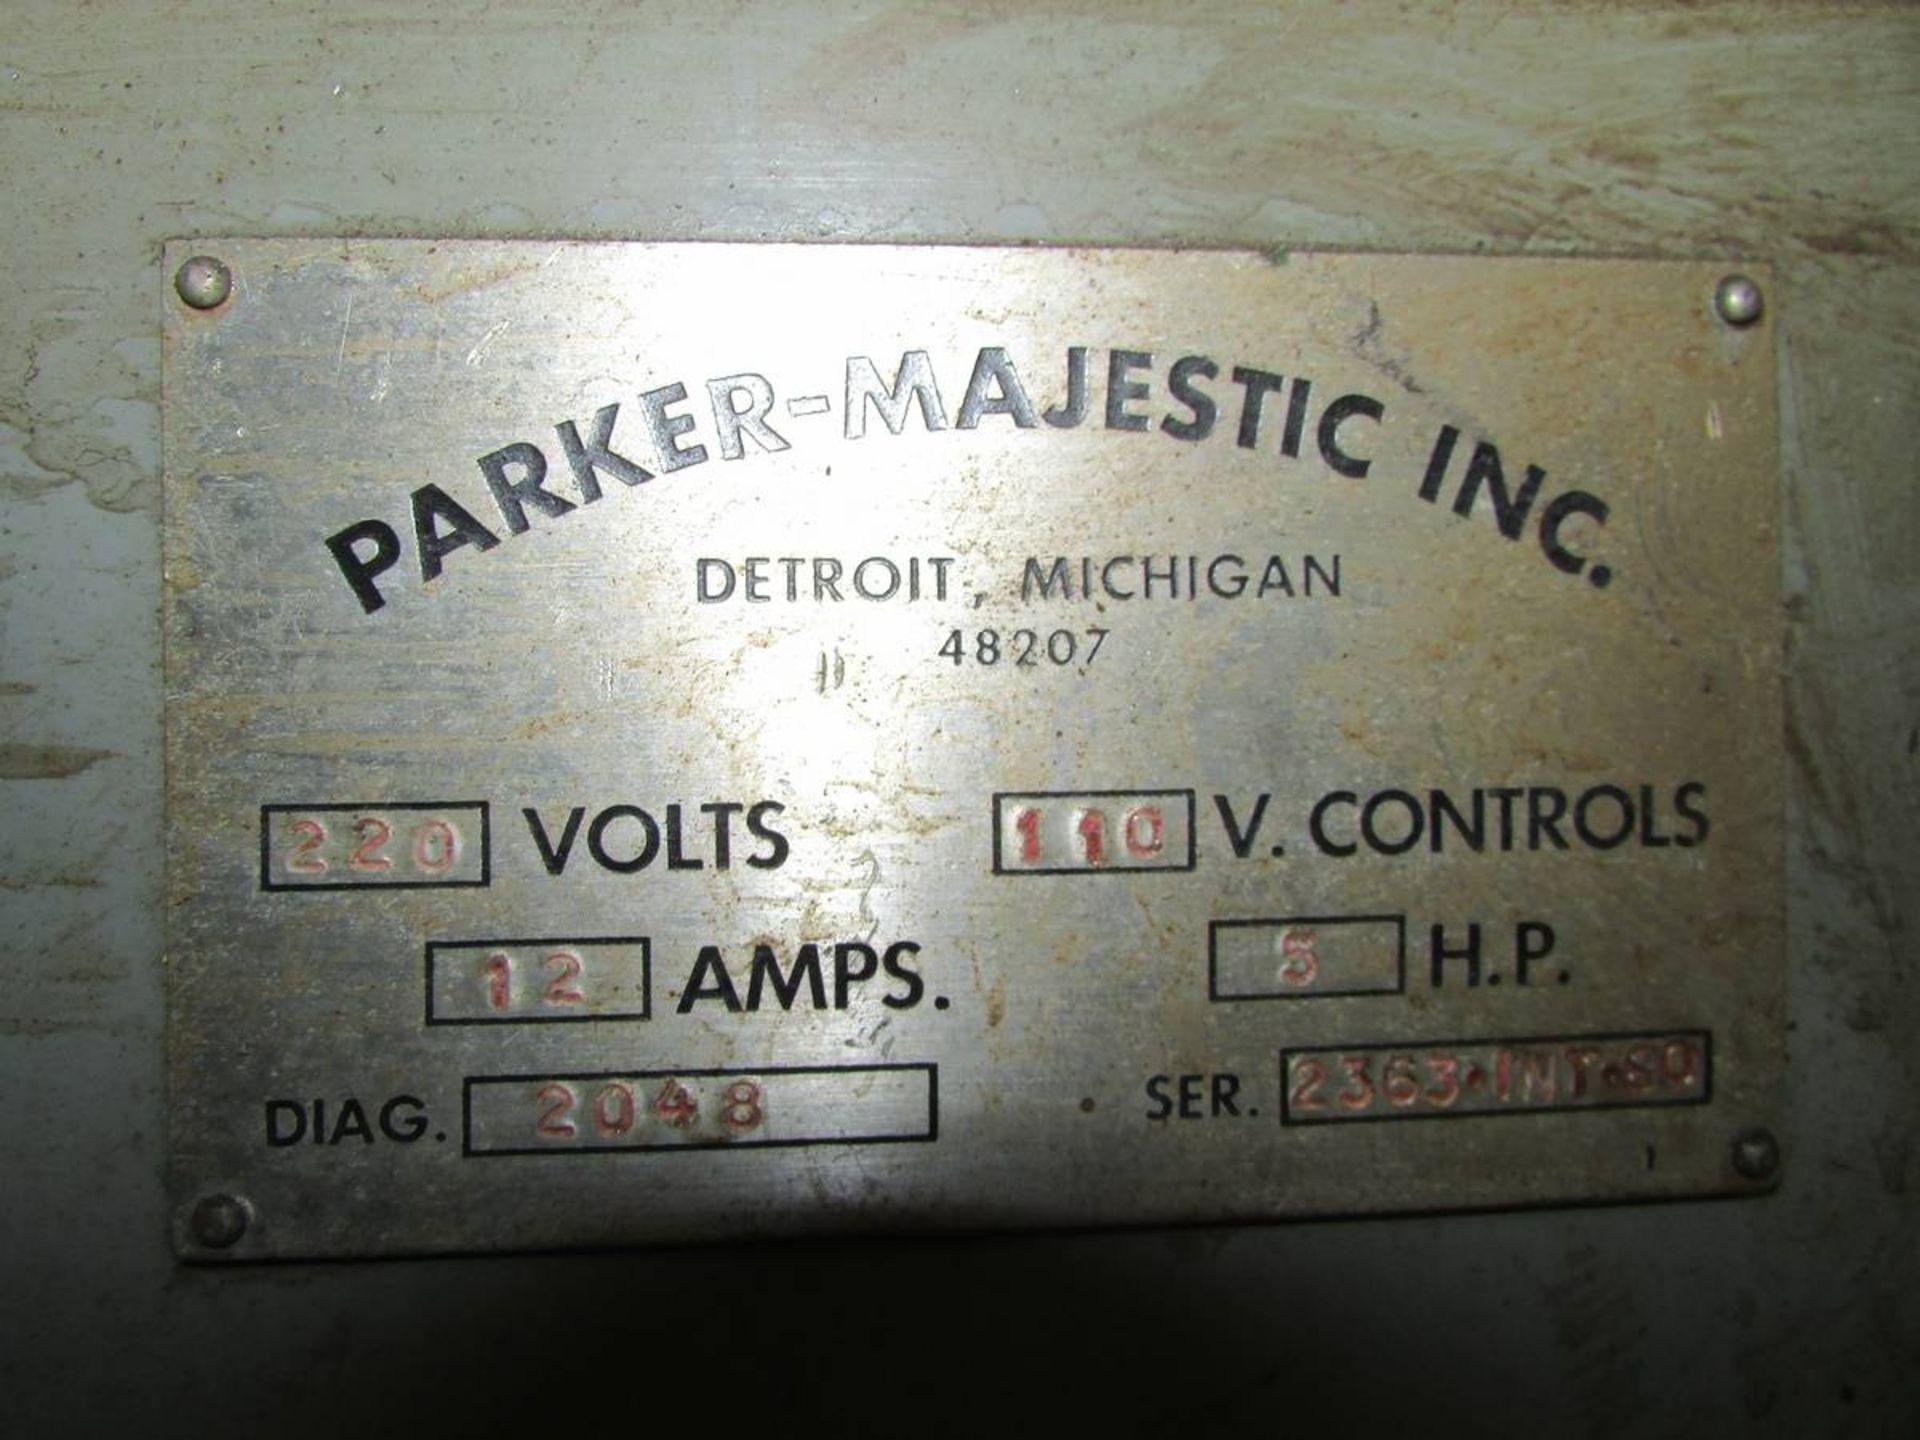 Parker Majestic No. 1 Internal ID Cylindrical Grinder - Image 18 of 18